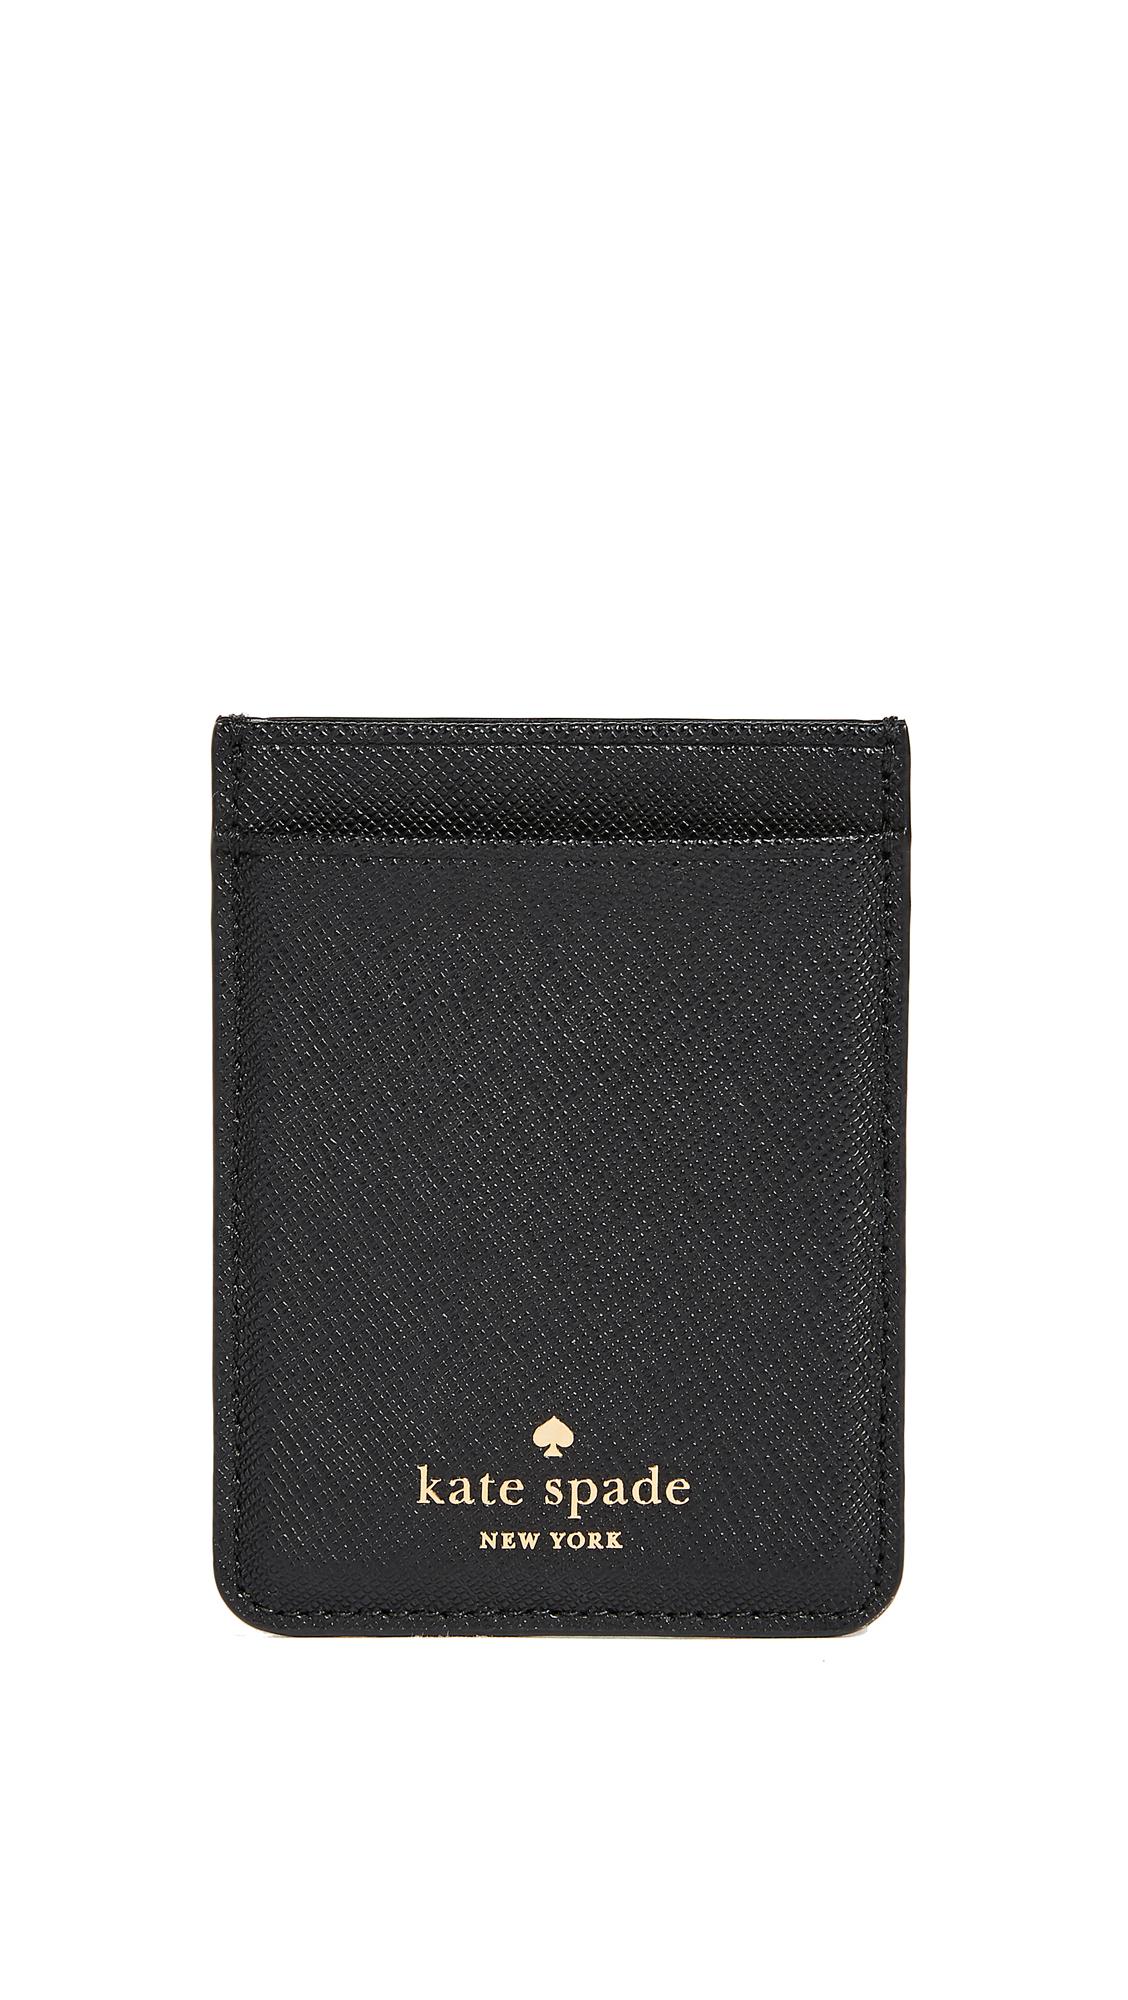 Kate Spade New York Double Sticker Phone Pocket - Black